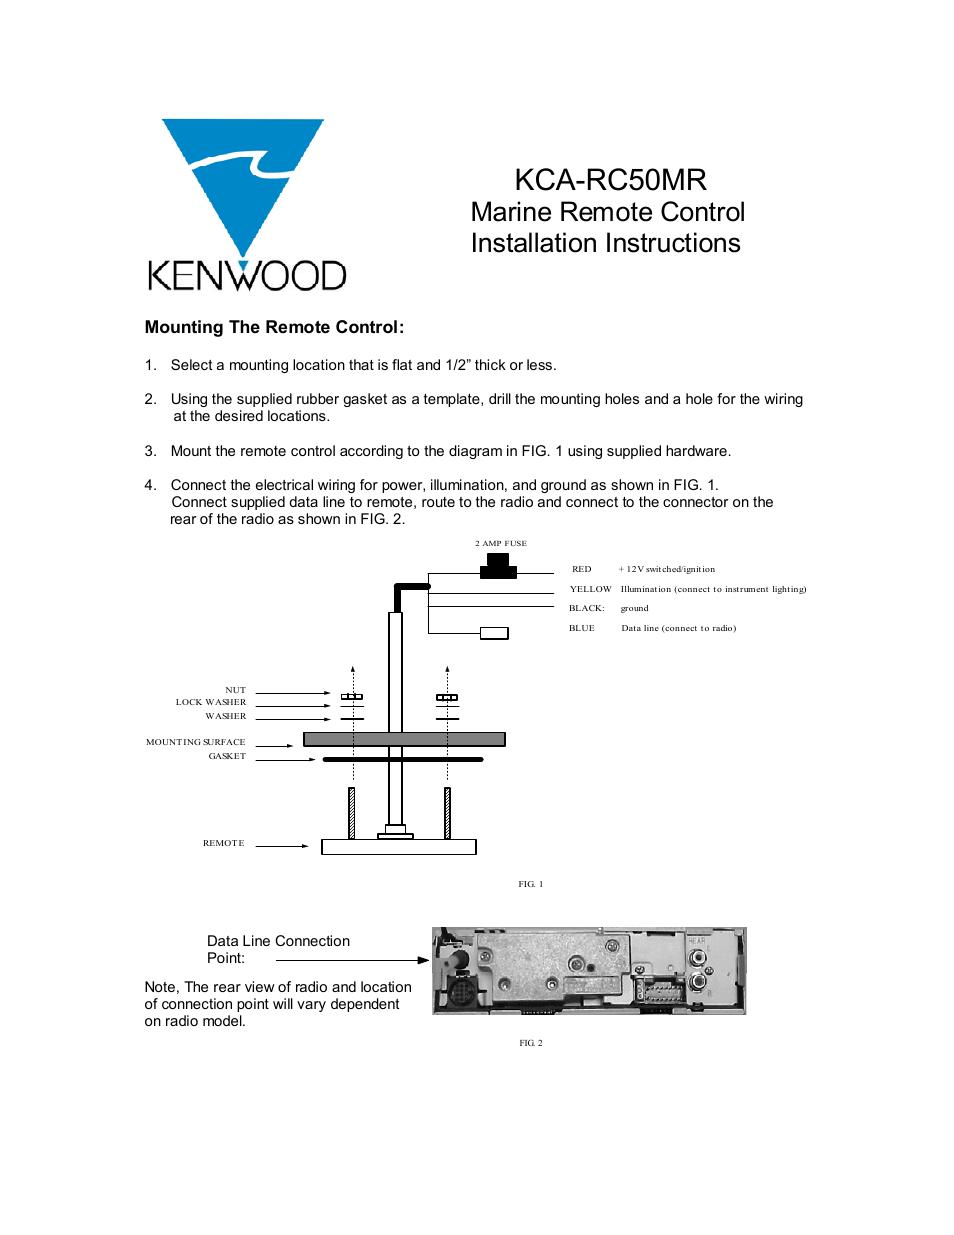 Kenwood Marine Remote Control Kca Rc50mr User Manual